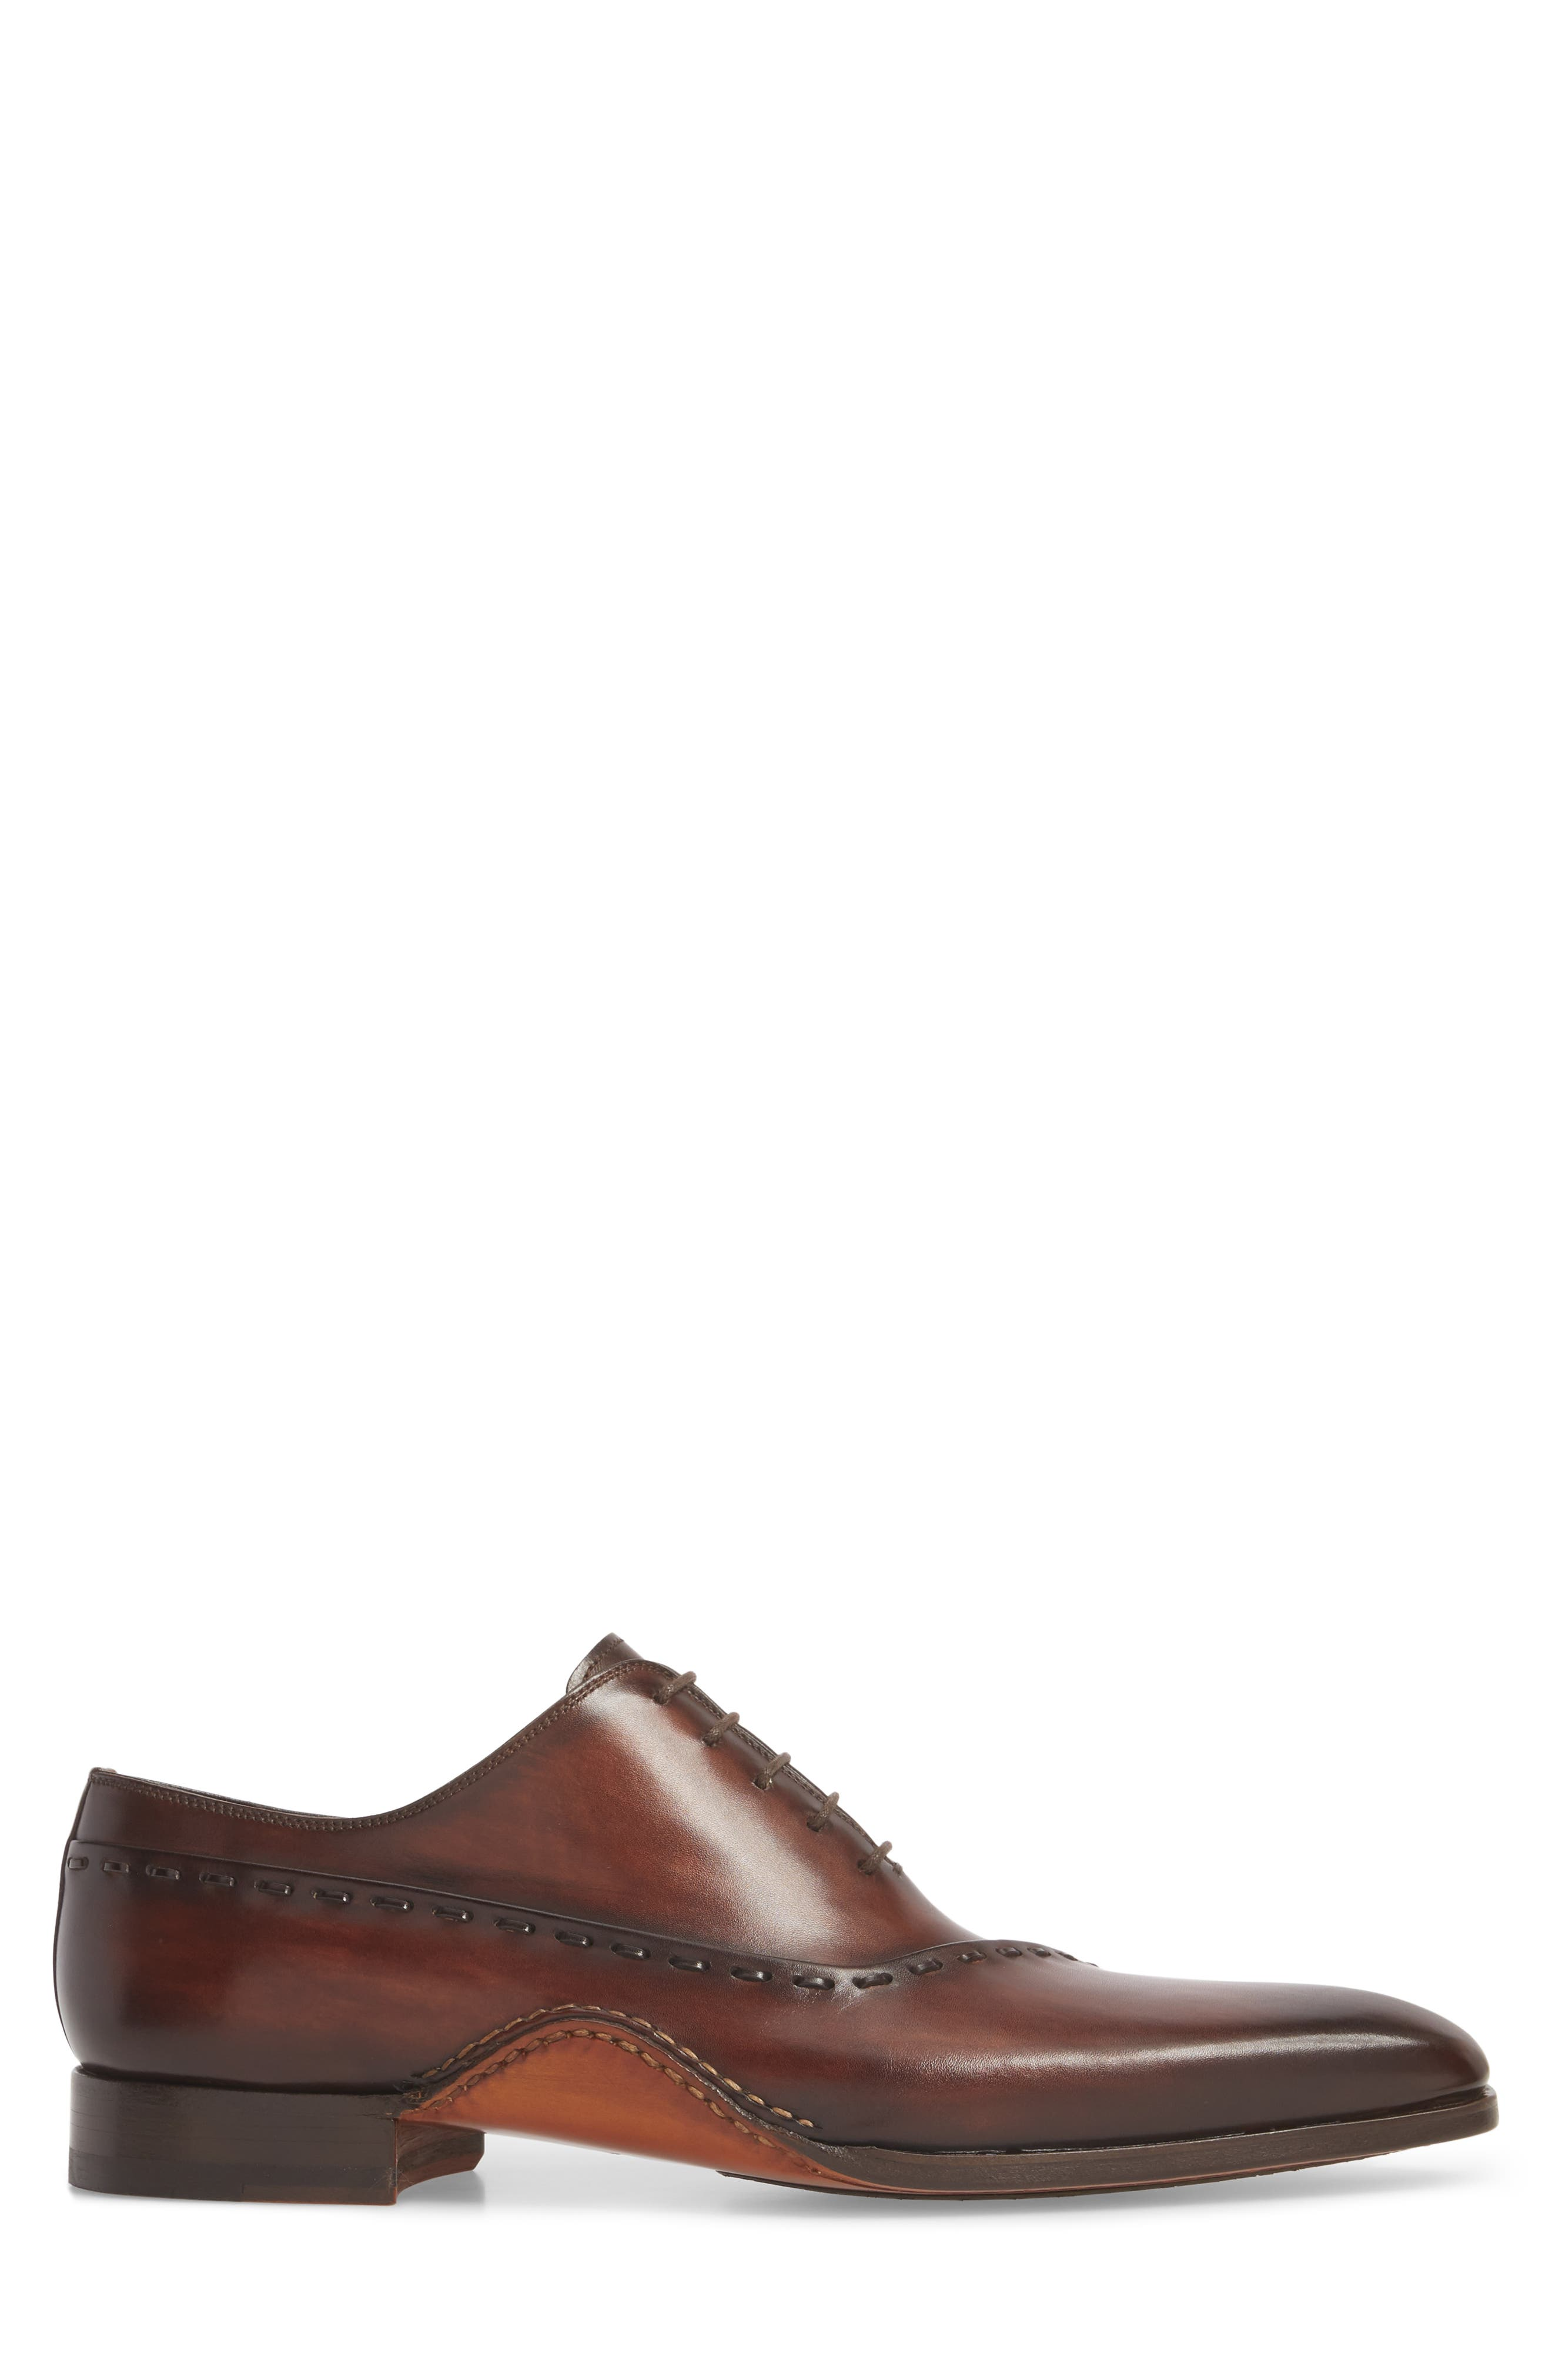 Kobe Asymmetrical Whole Cut Shoe,                             Alternate thumbnail 3, color,                             Mid-Brown Leather